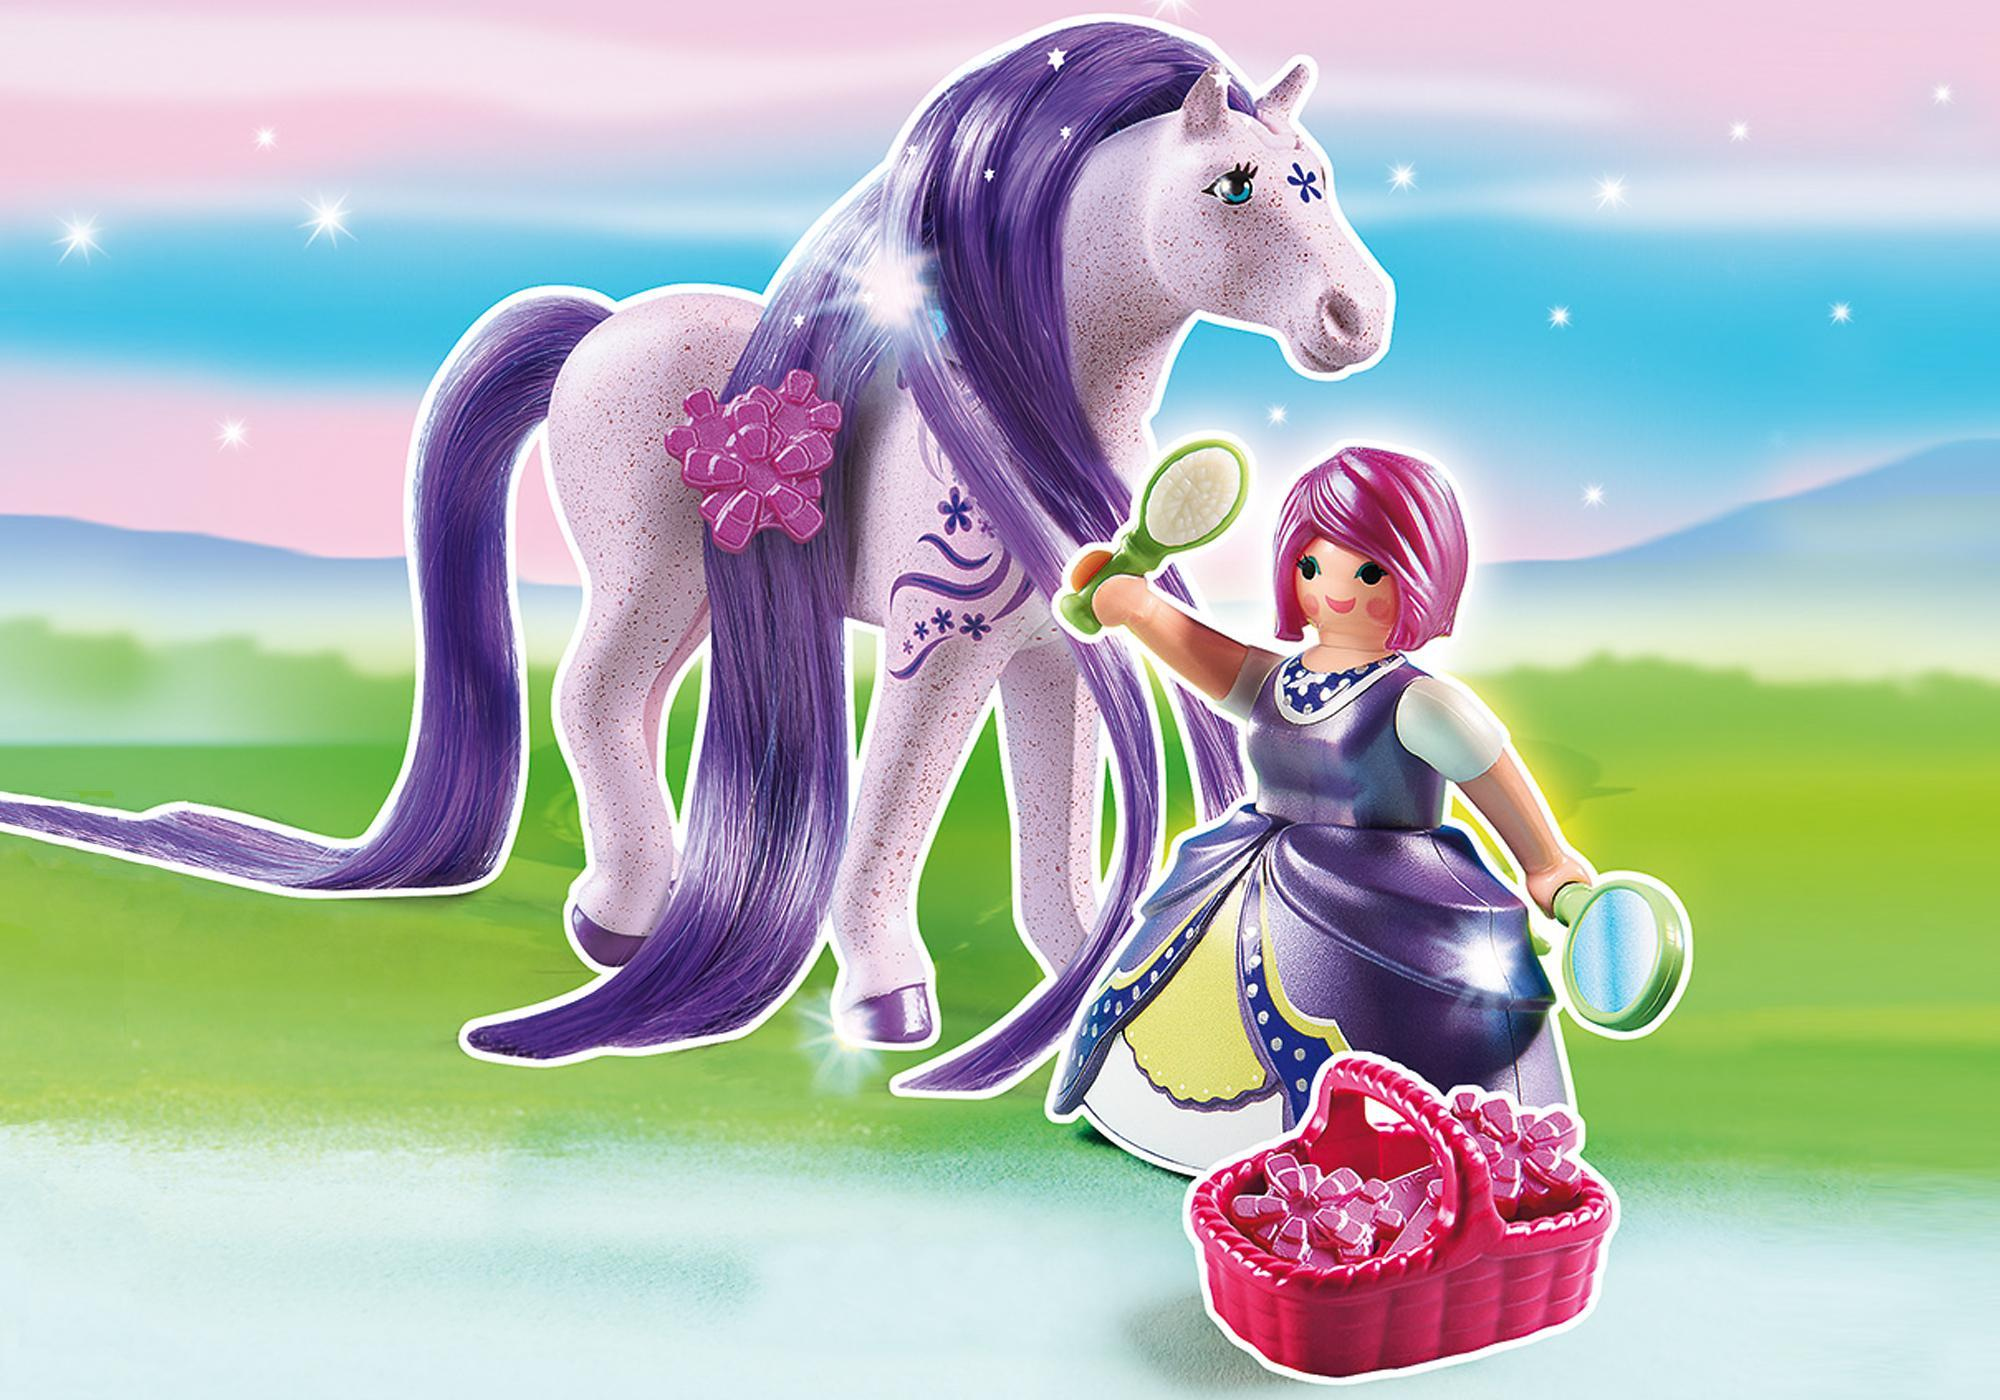 http://media.playmobil.com/i/playmobil/6167_product_detail/Принцесса Виола с Лошадкой